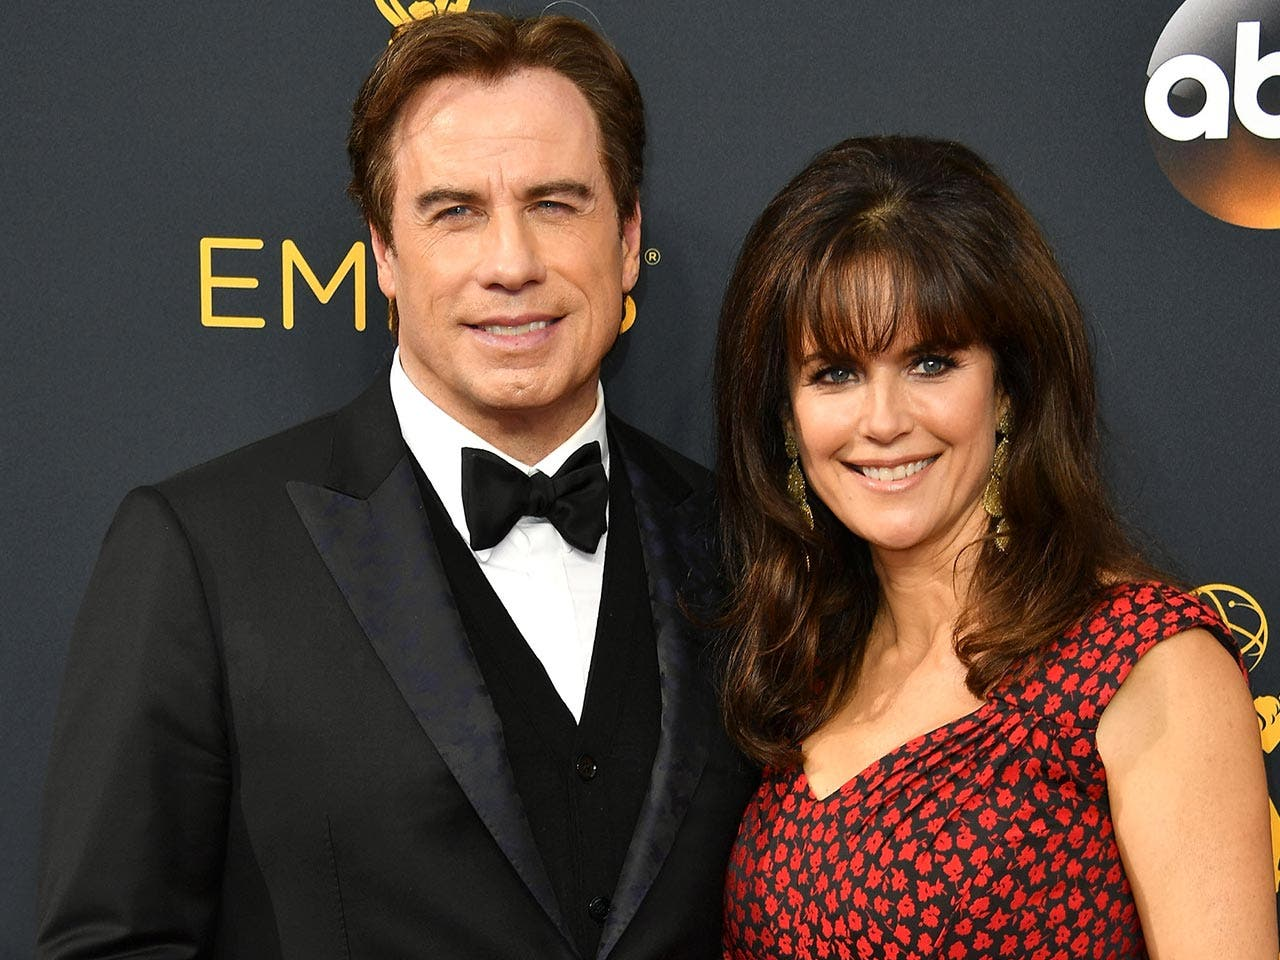 John Travolta and Kelly Preston | Steve Granitz/Getty Images